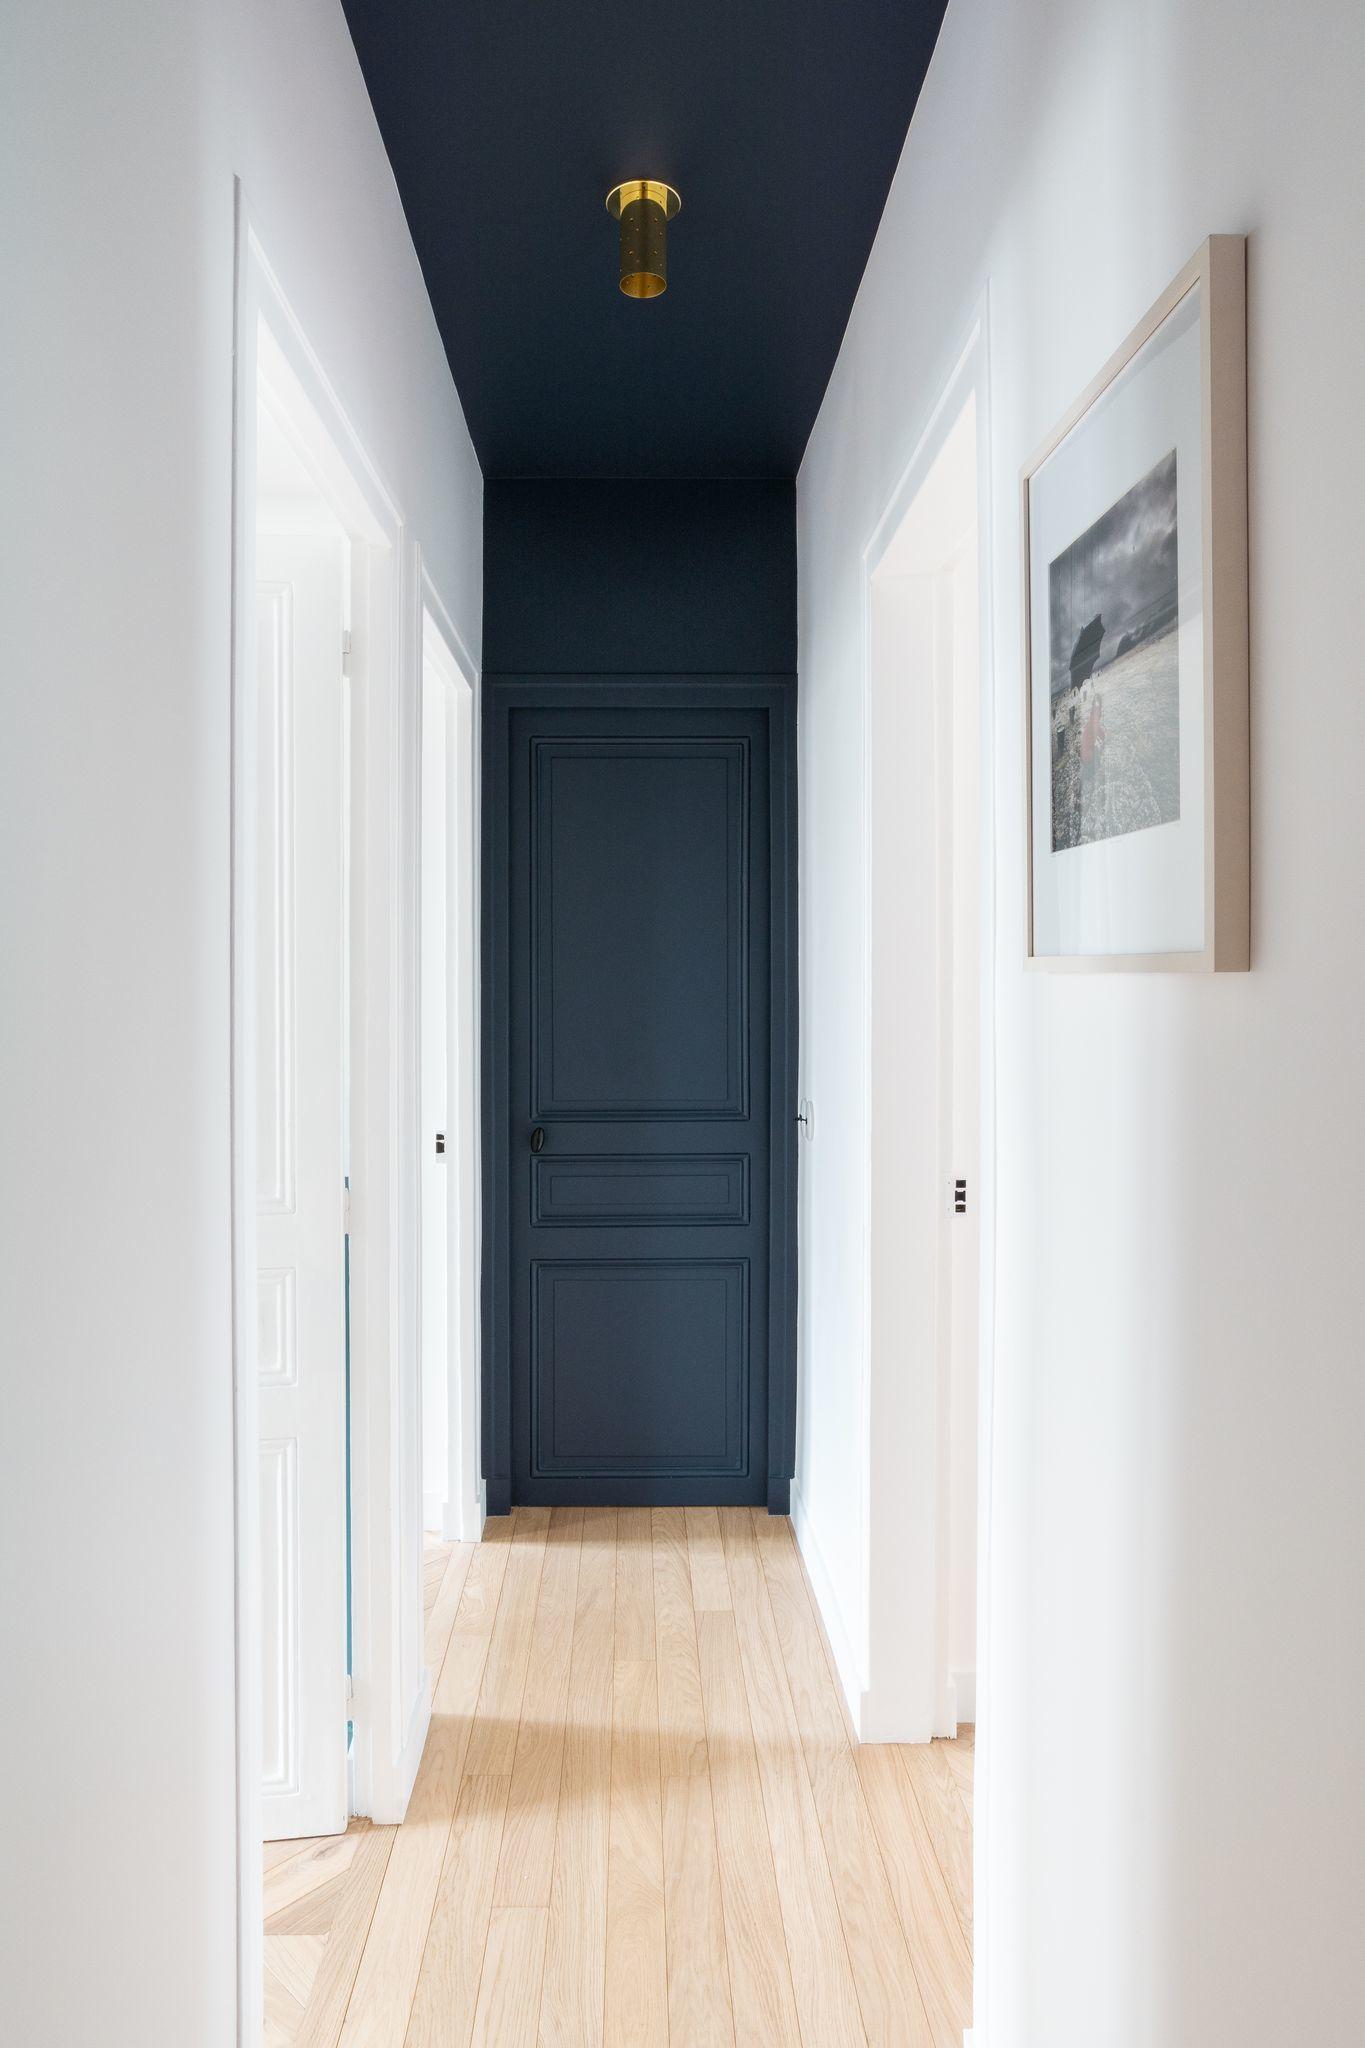 Feature door and ceiling